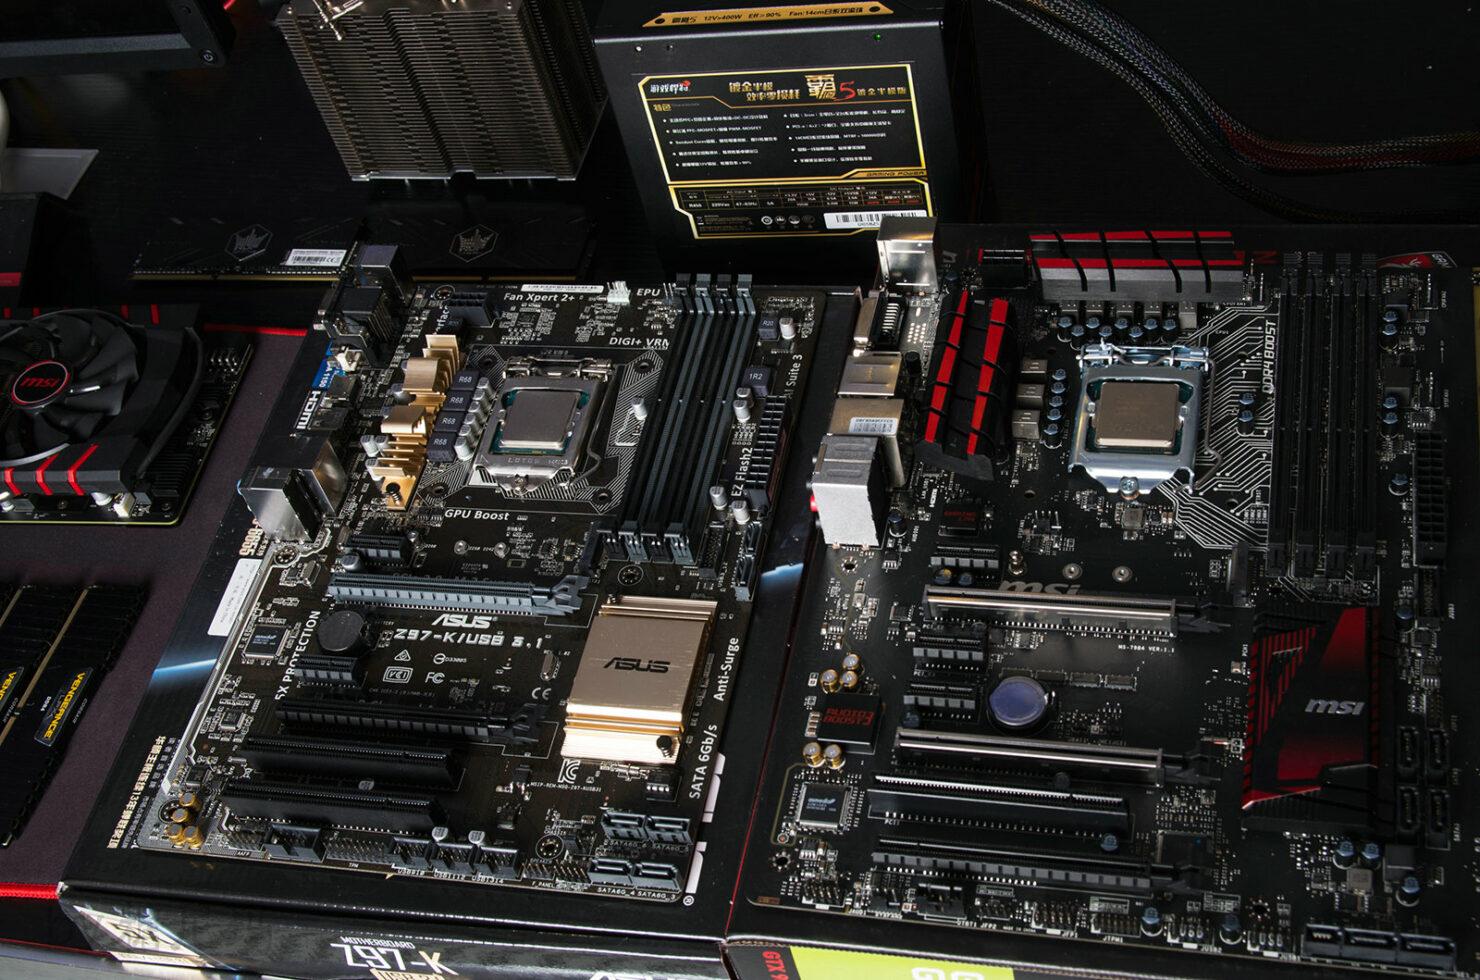 intel-core-i7-6700k-vs-core-i7-4790k_motherboards